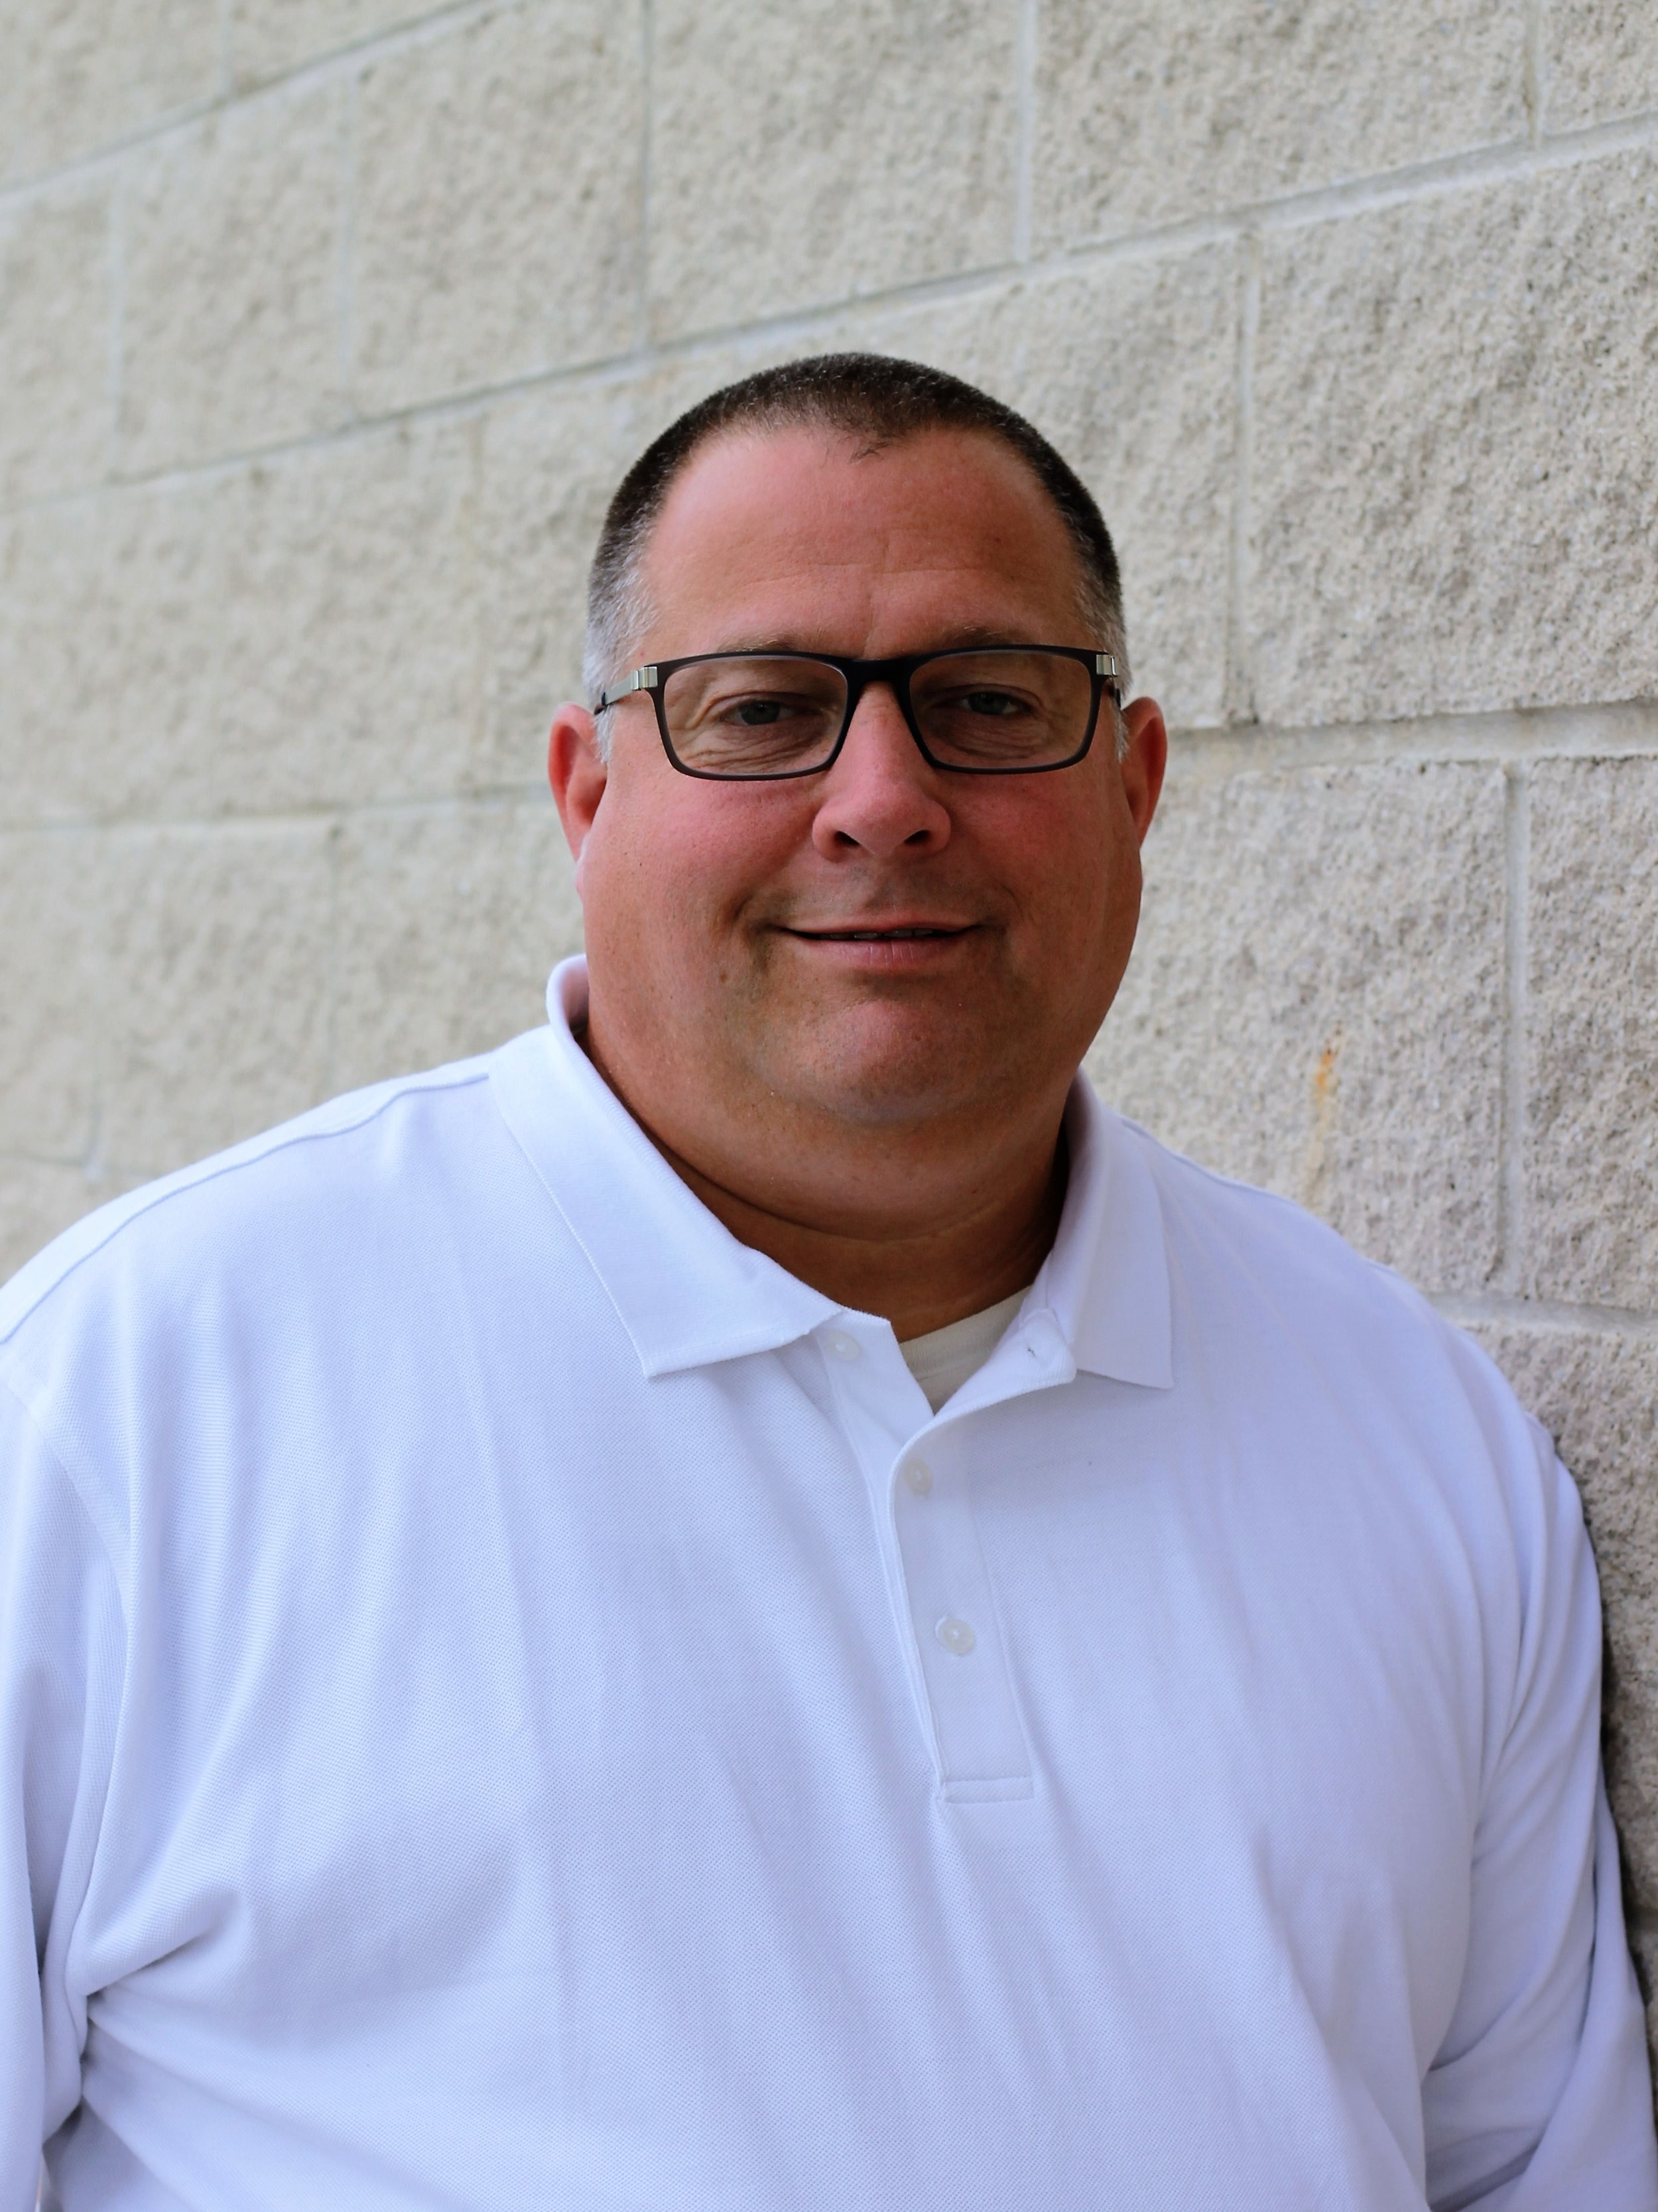 RJ Lumbrezer, PS Named Fulton County Economic Development Board President